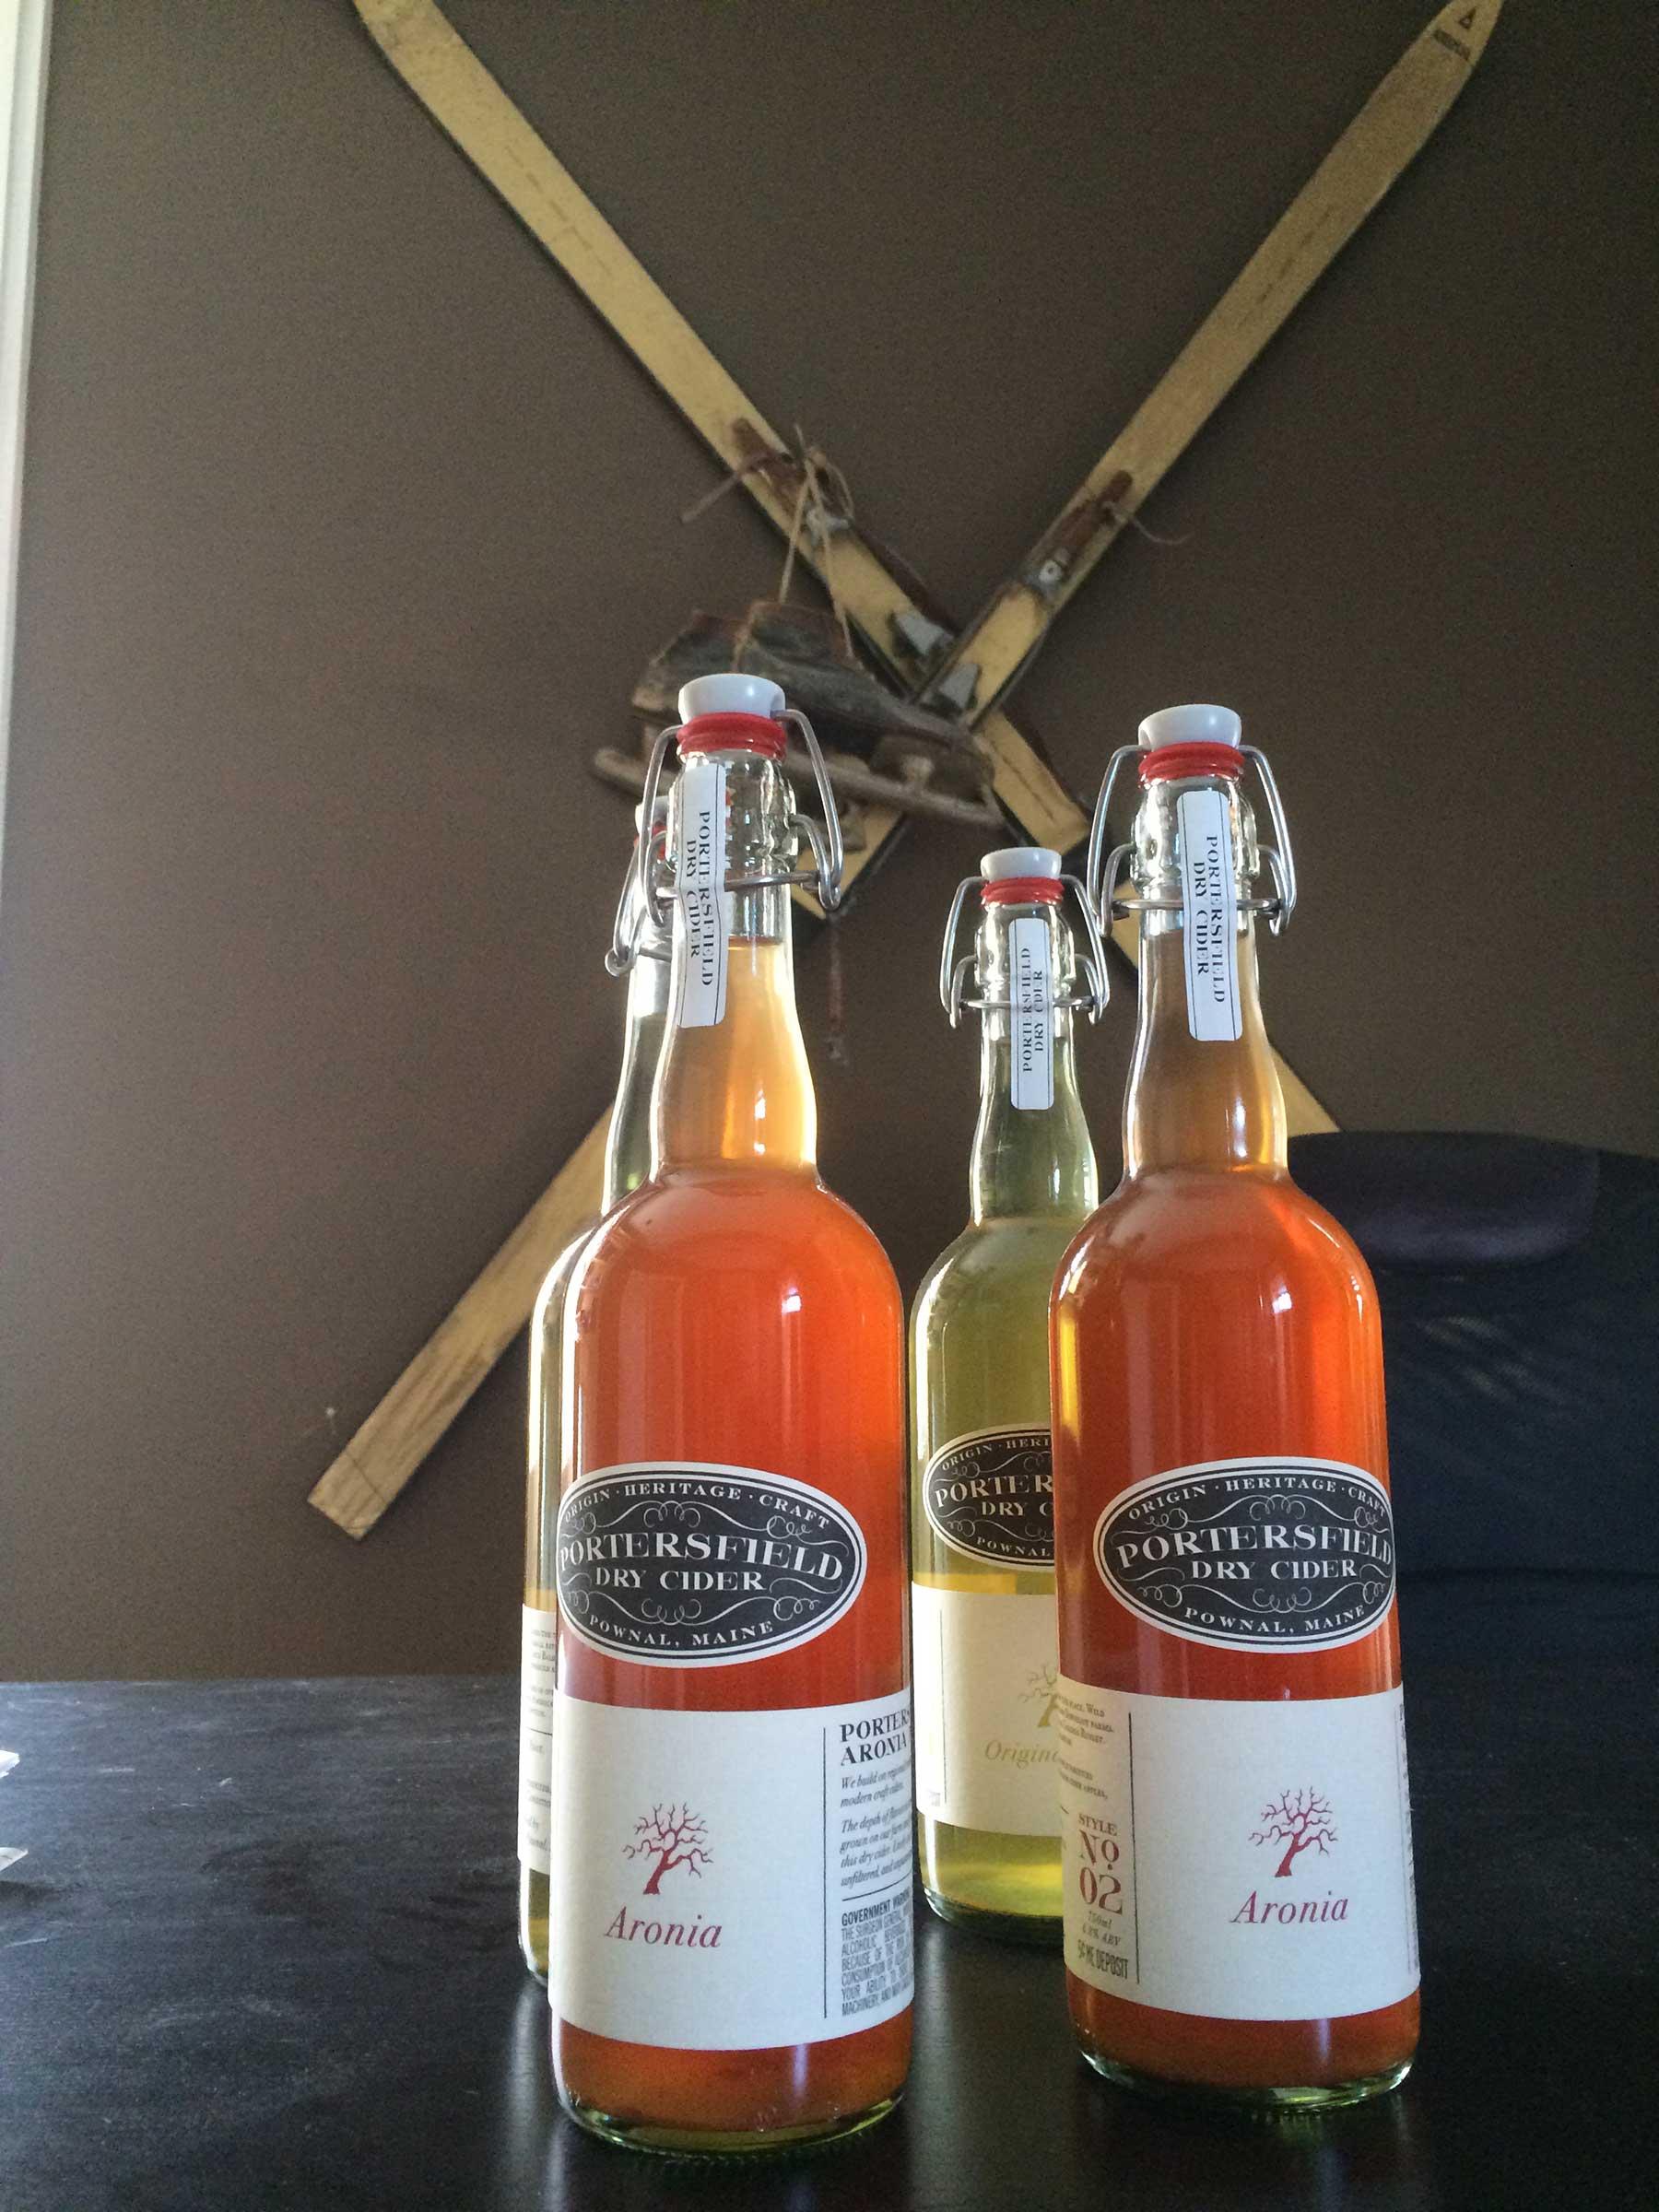 Portersfield Dry Cider Branding